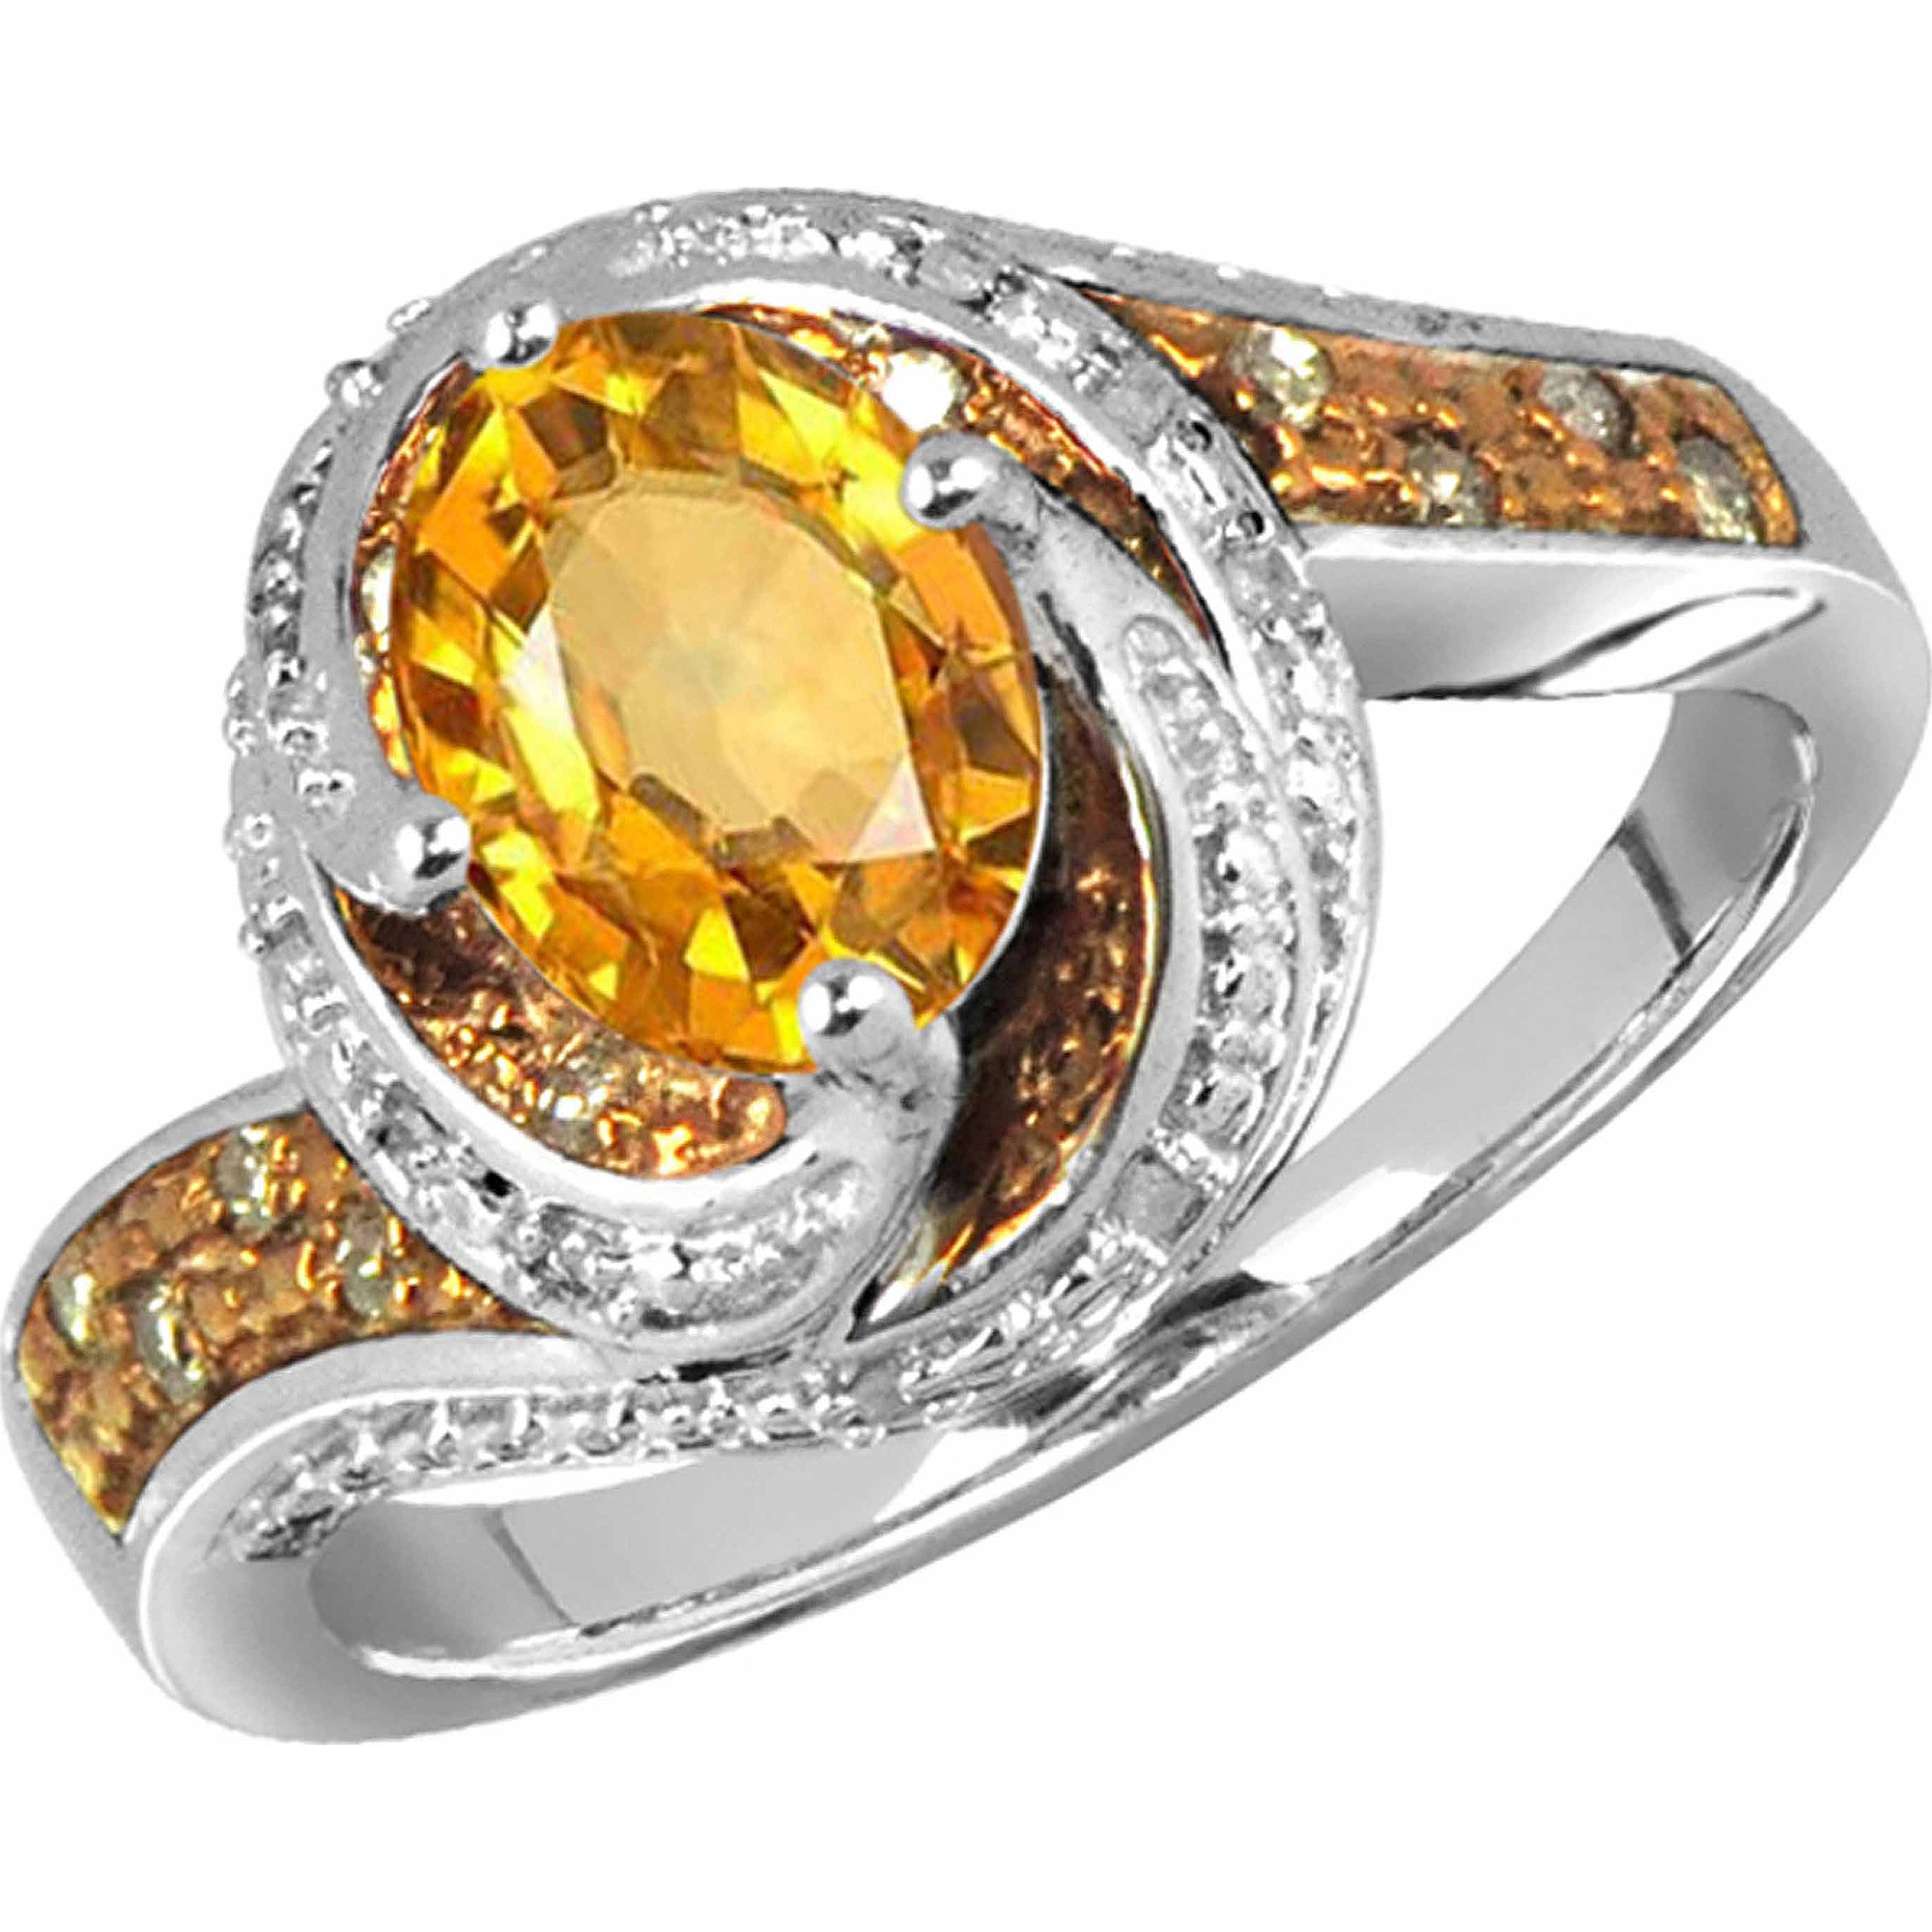 JewelersClub 1.11 Carat T.G.W. Citrine Gemstone & 1/10 Carat T.W. Champagne & White Diamond Ring in Sterling Silver